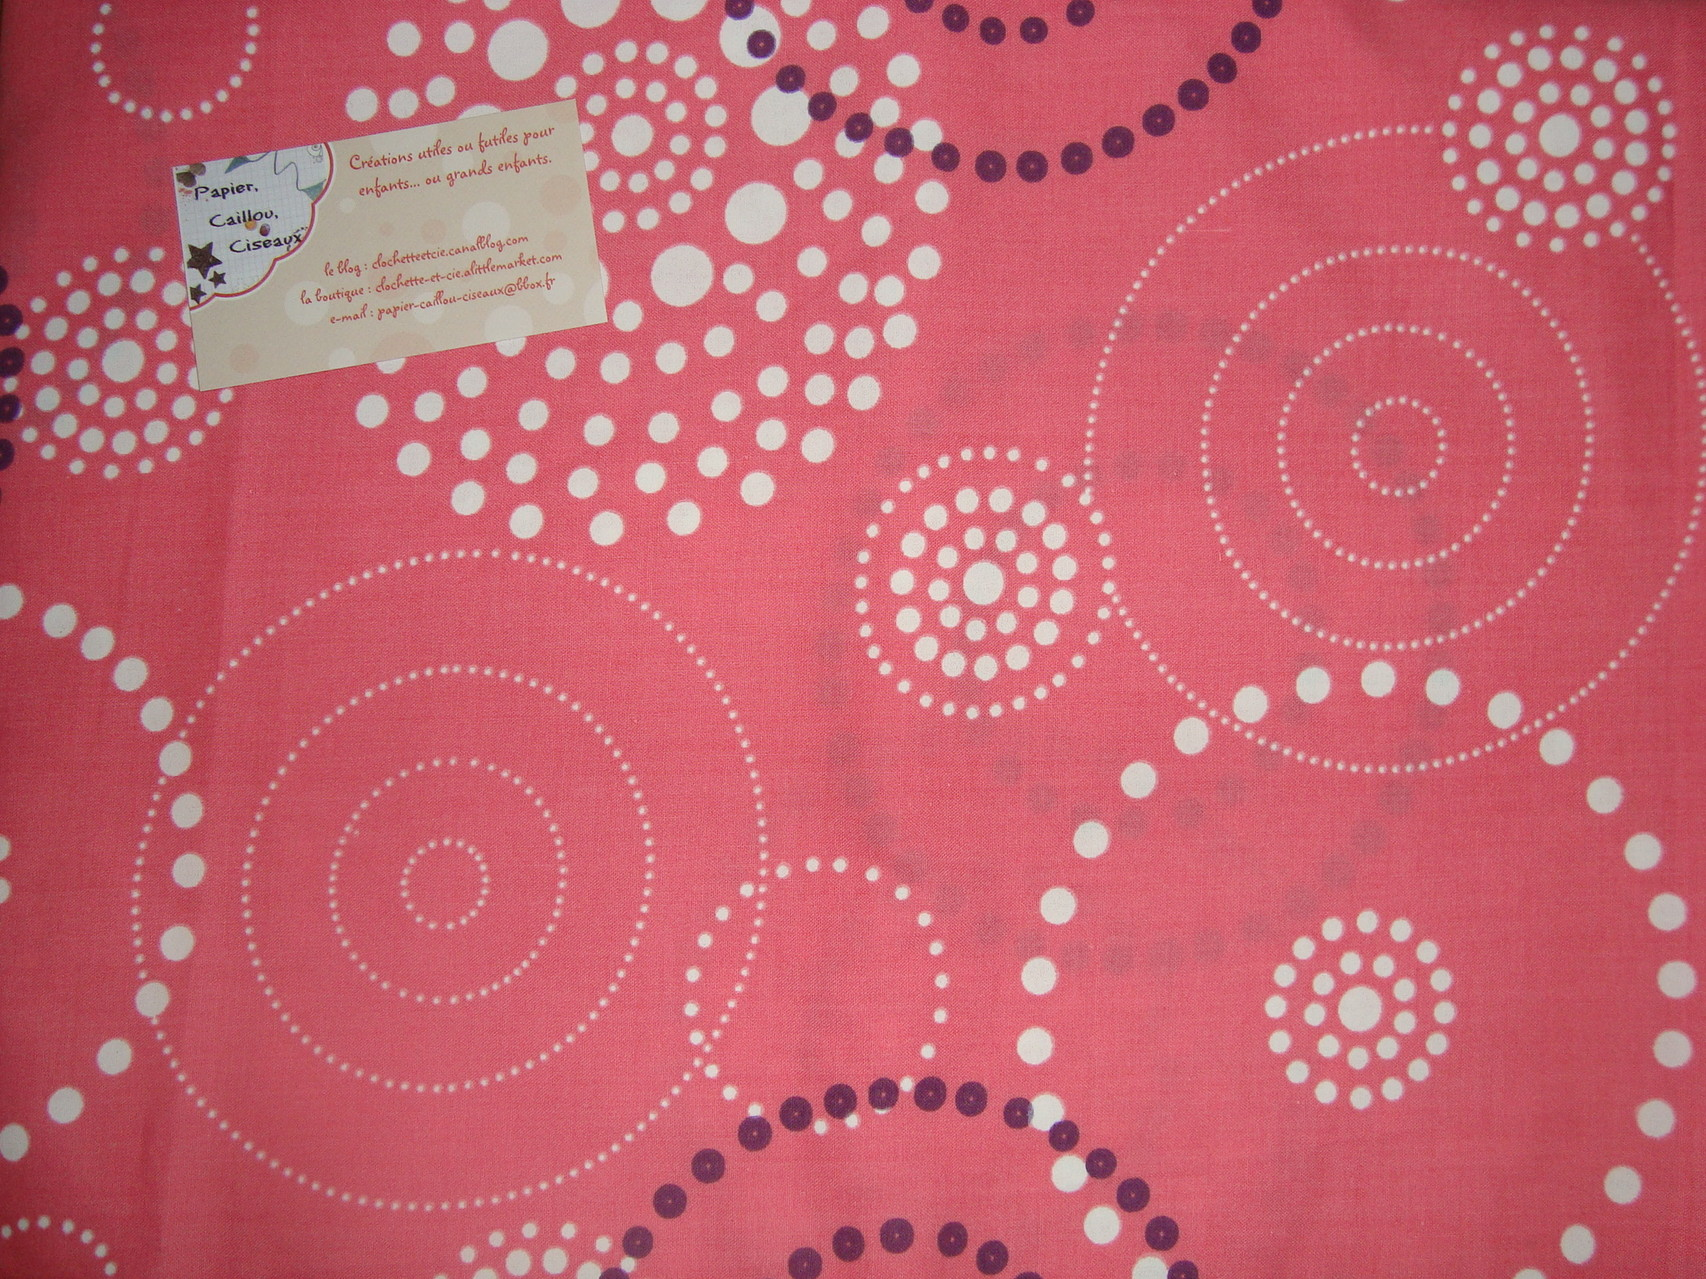 Cercles et Spirales fond rose